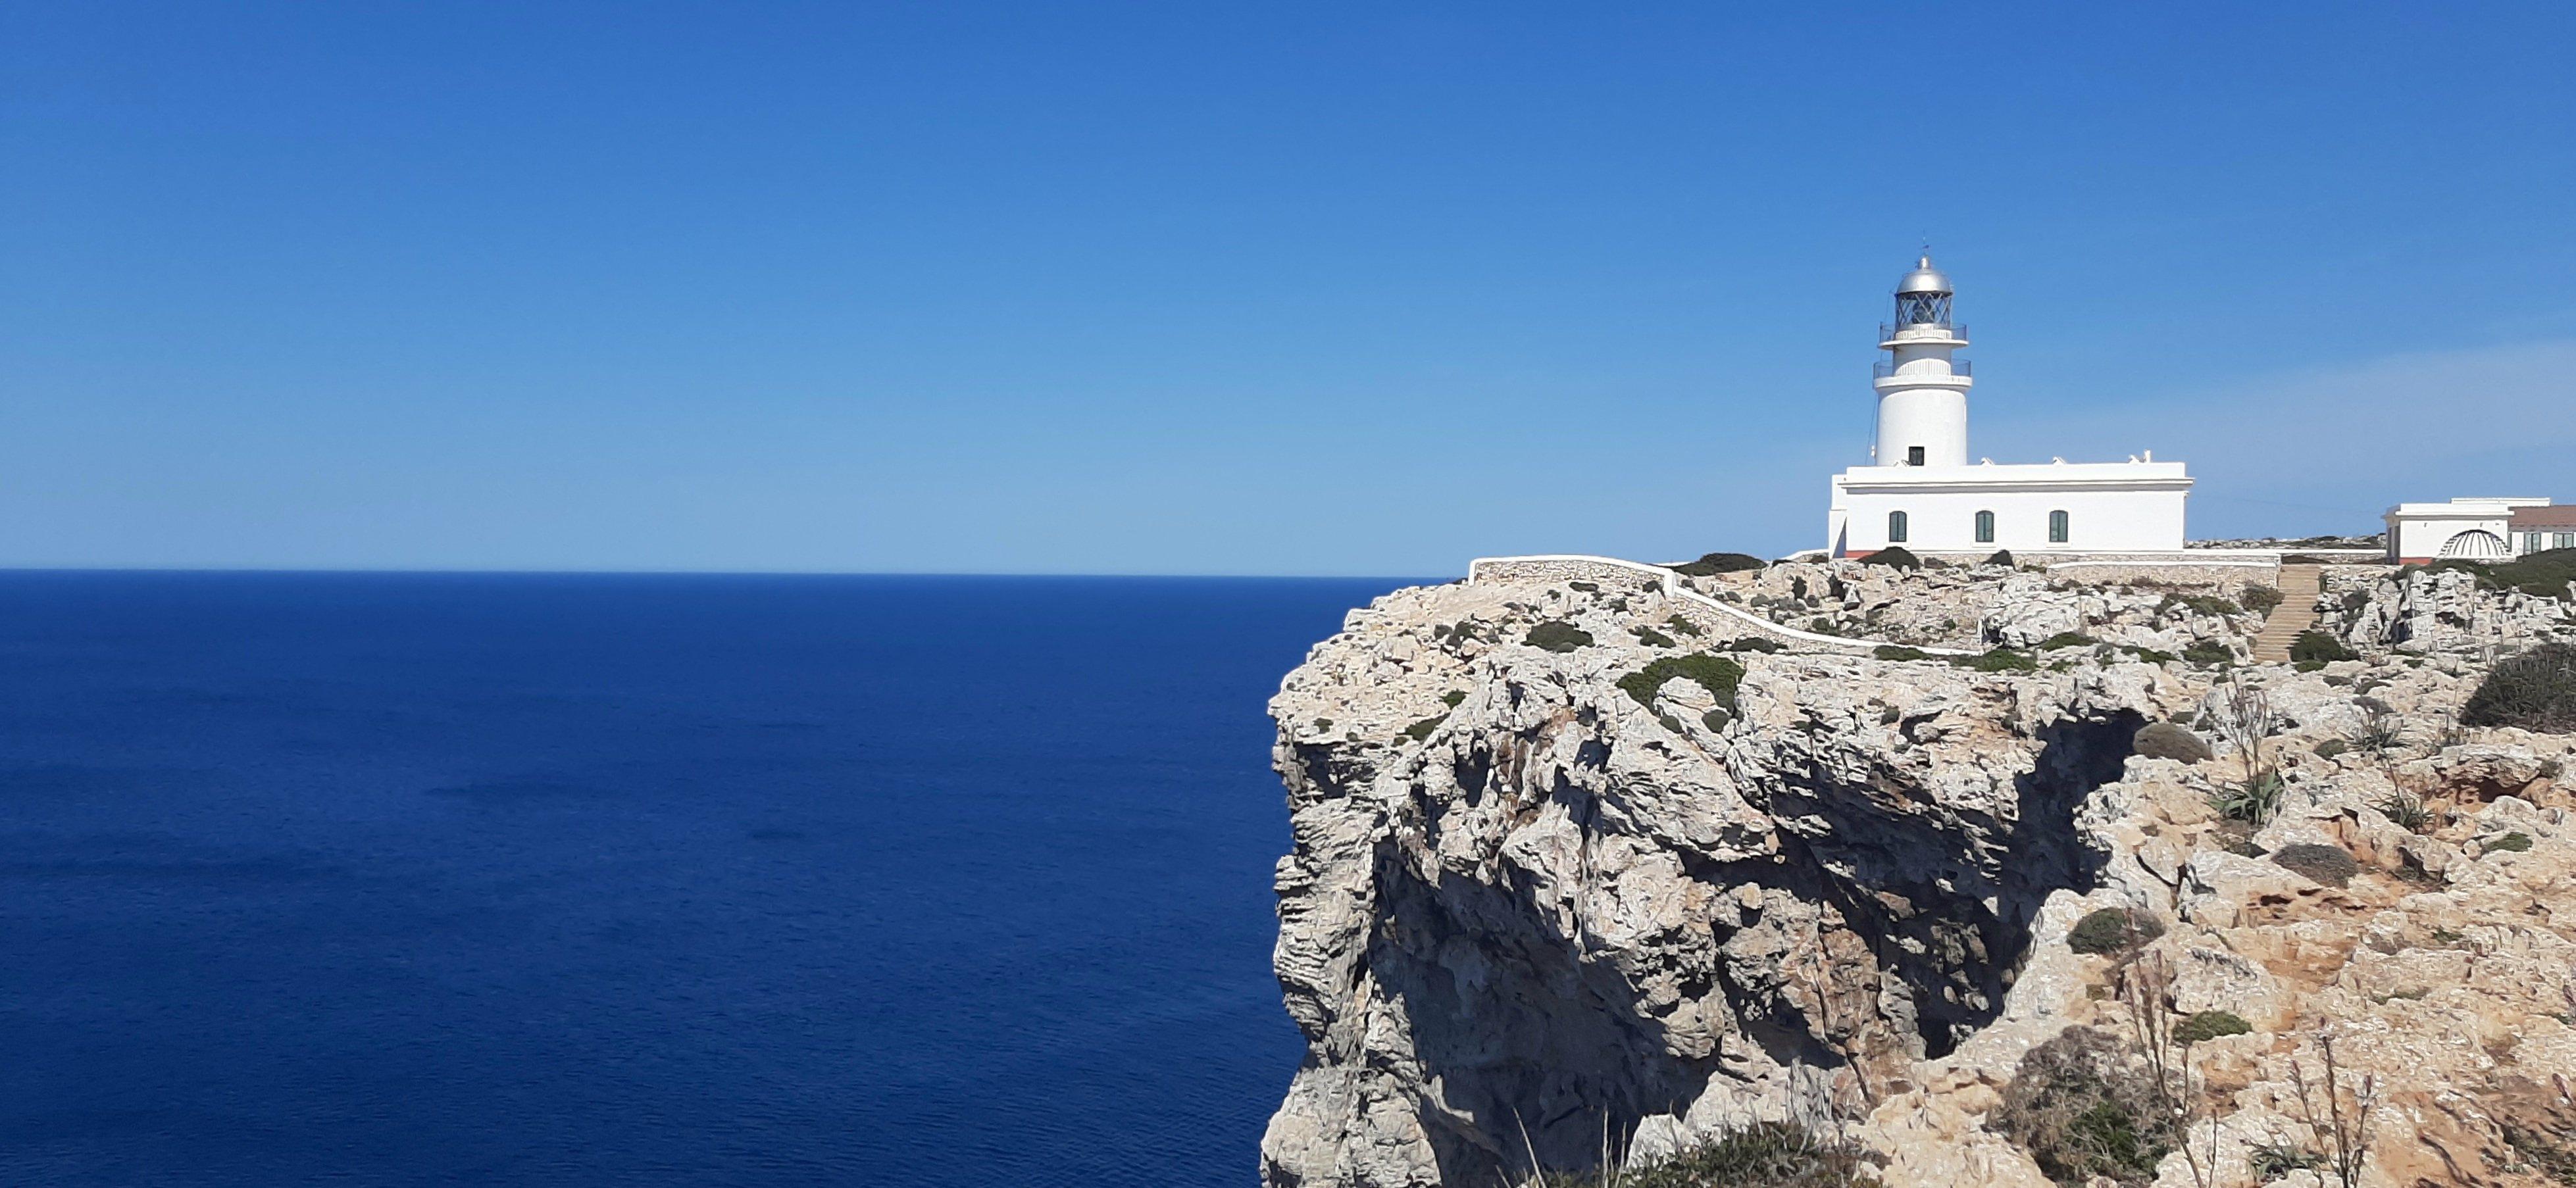 Faro de Cavalleria, Menorca, 6 mayo 2021